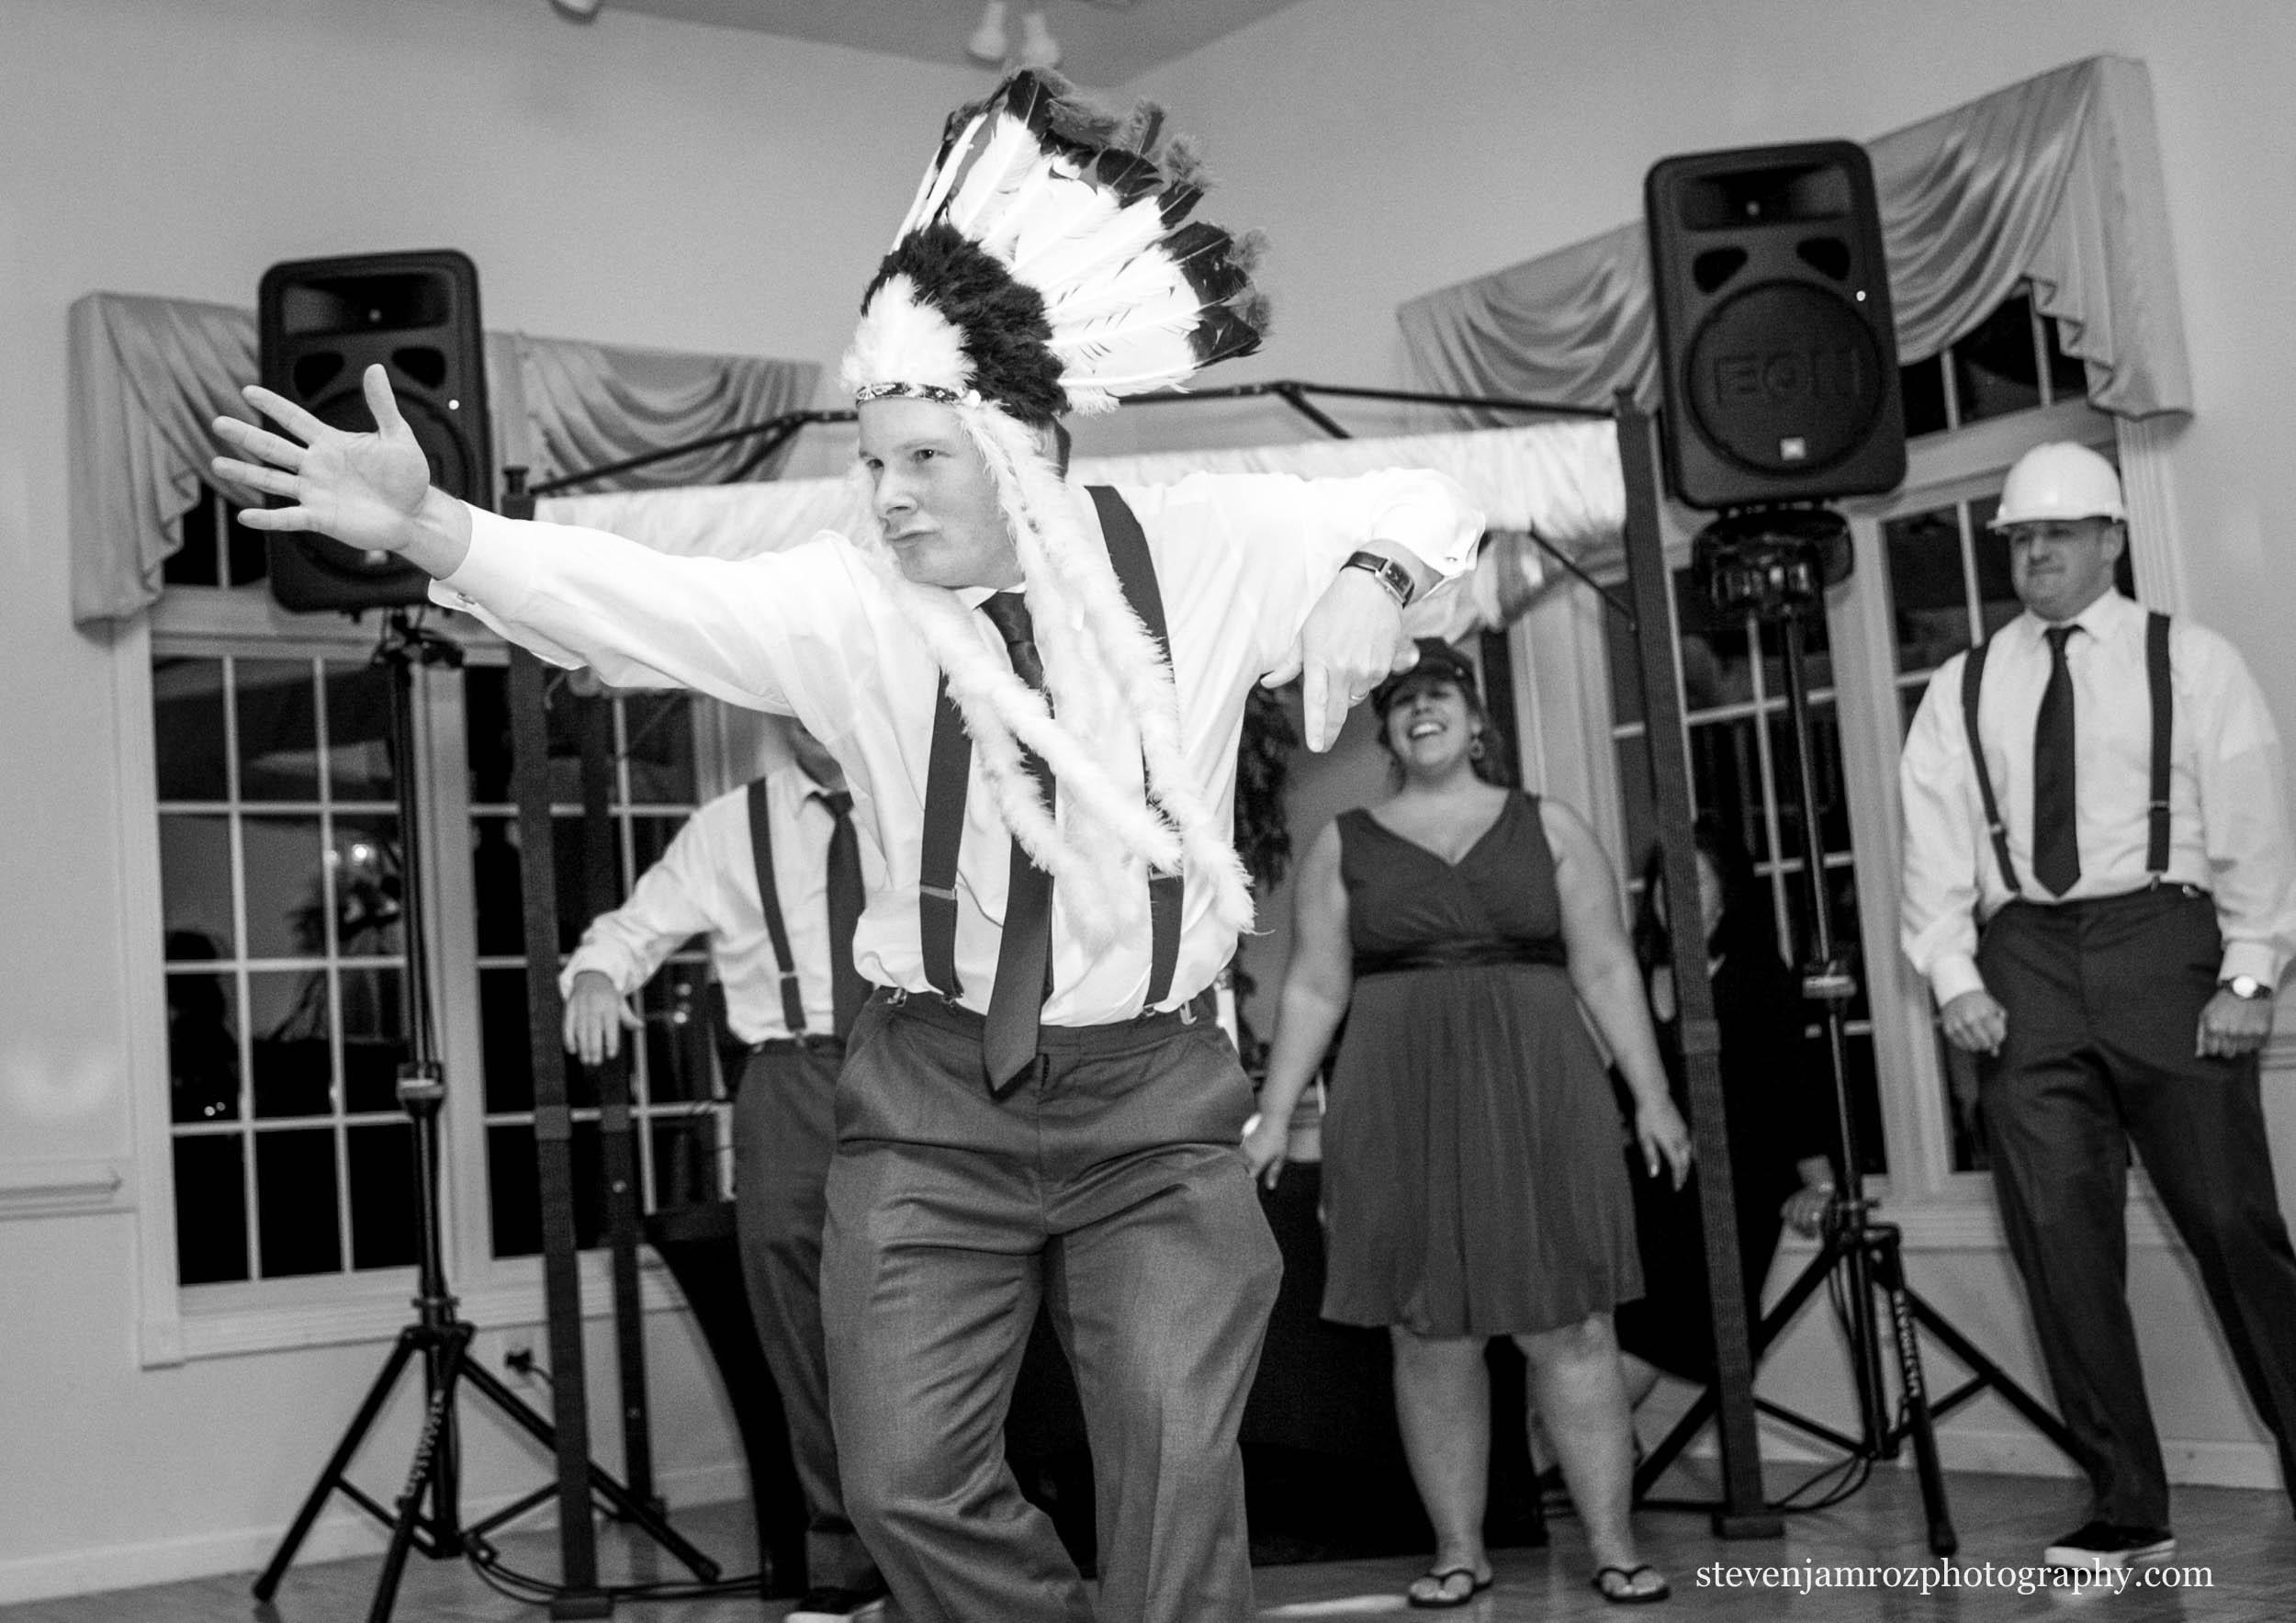 ymca-dance-wedding-reception-hudson-manor-steven-jamroz-photography-0584.jpg